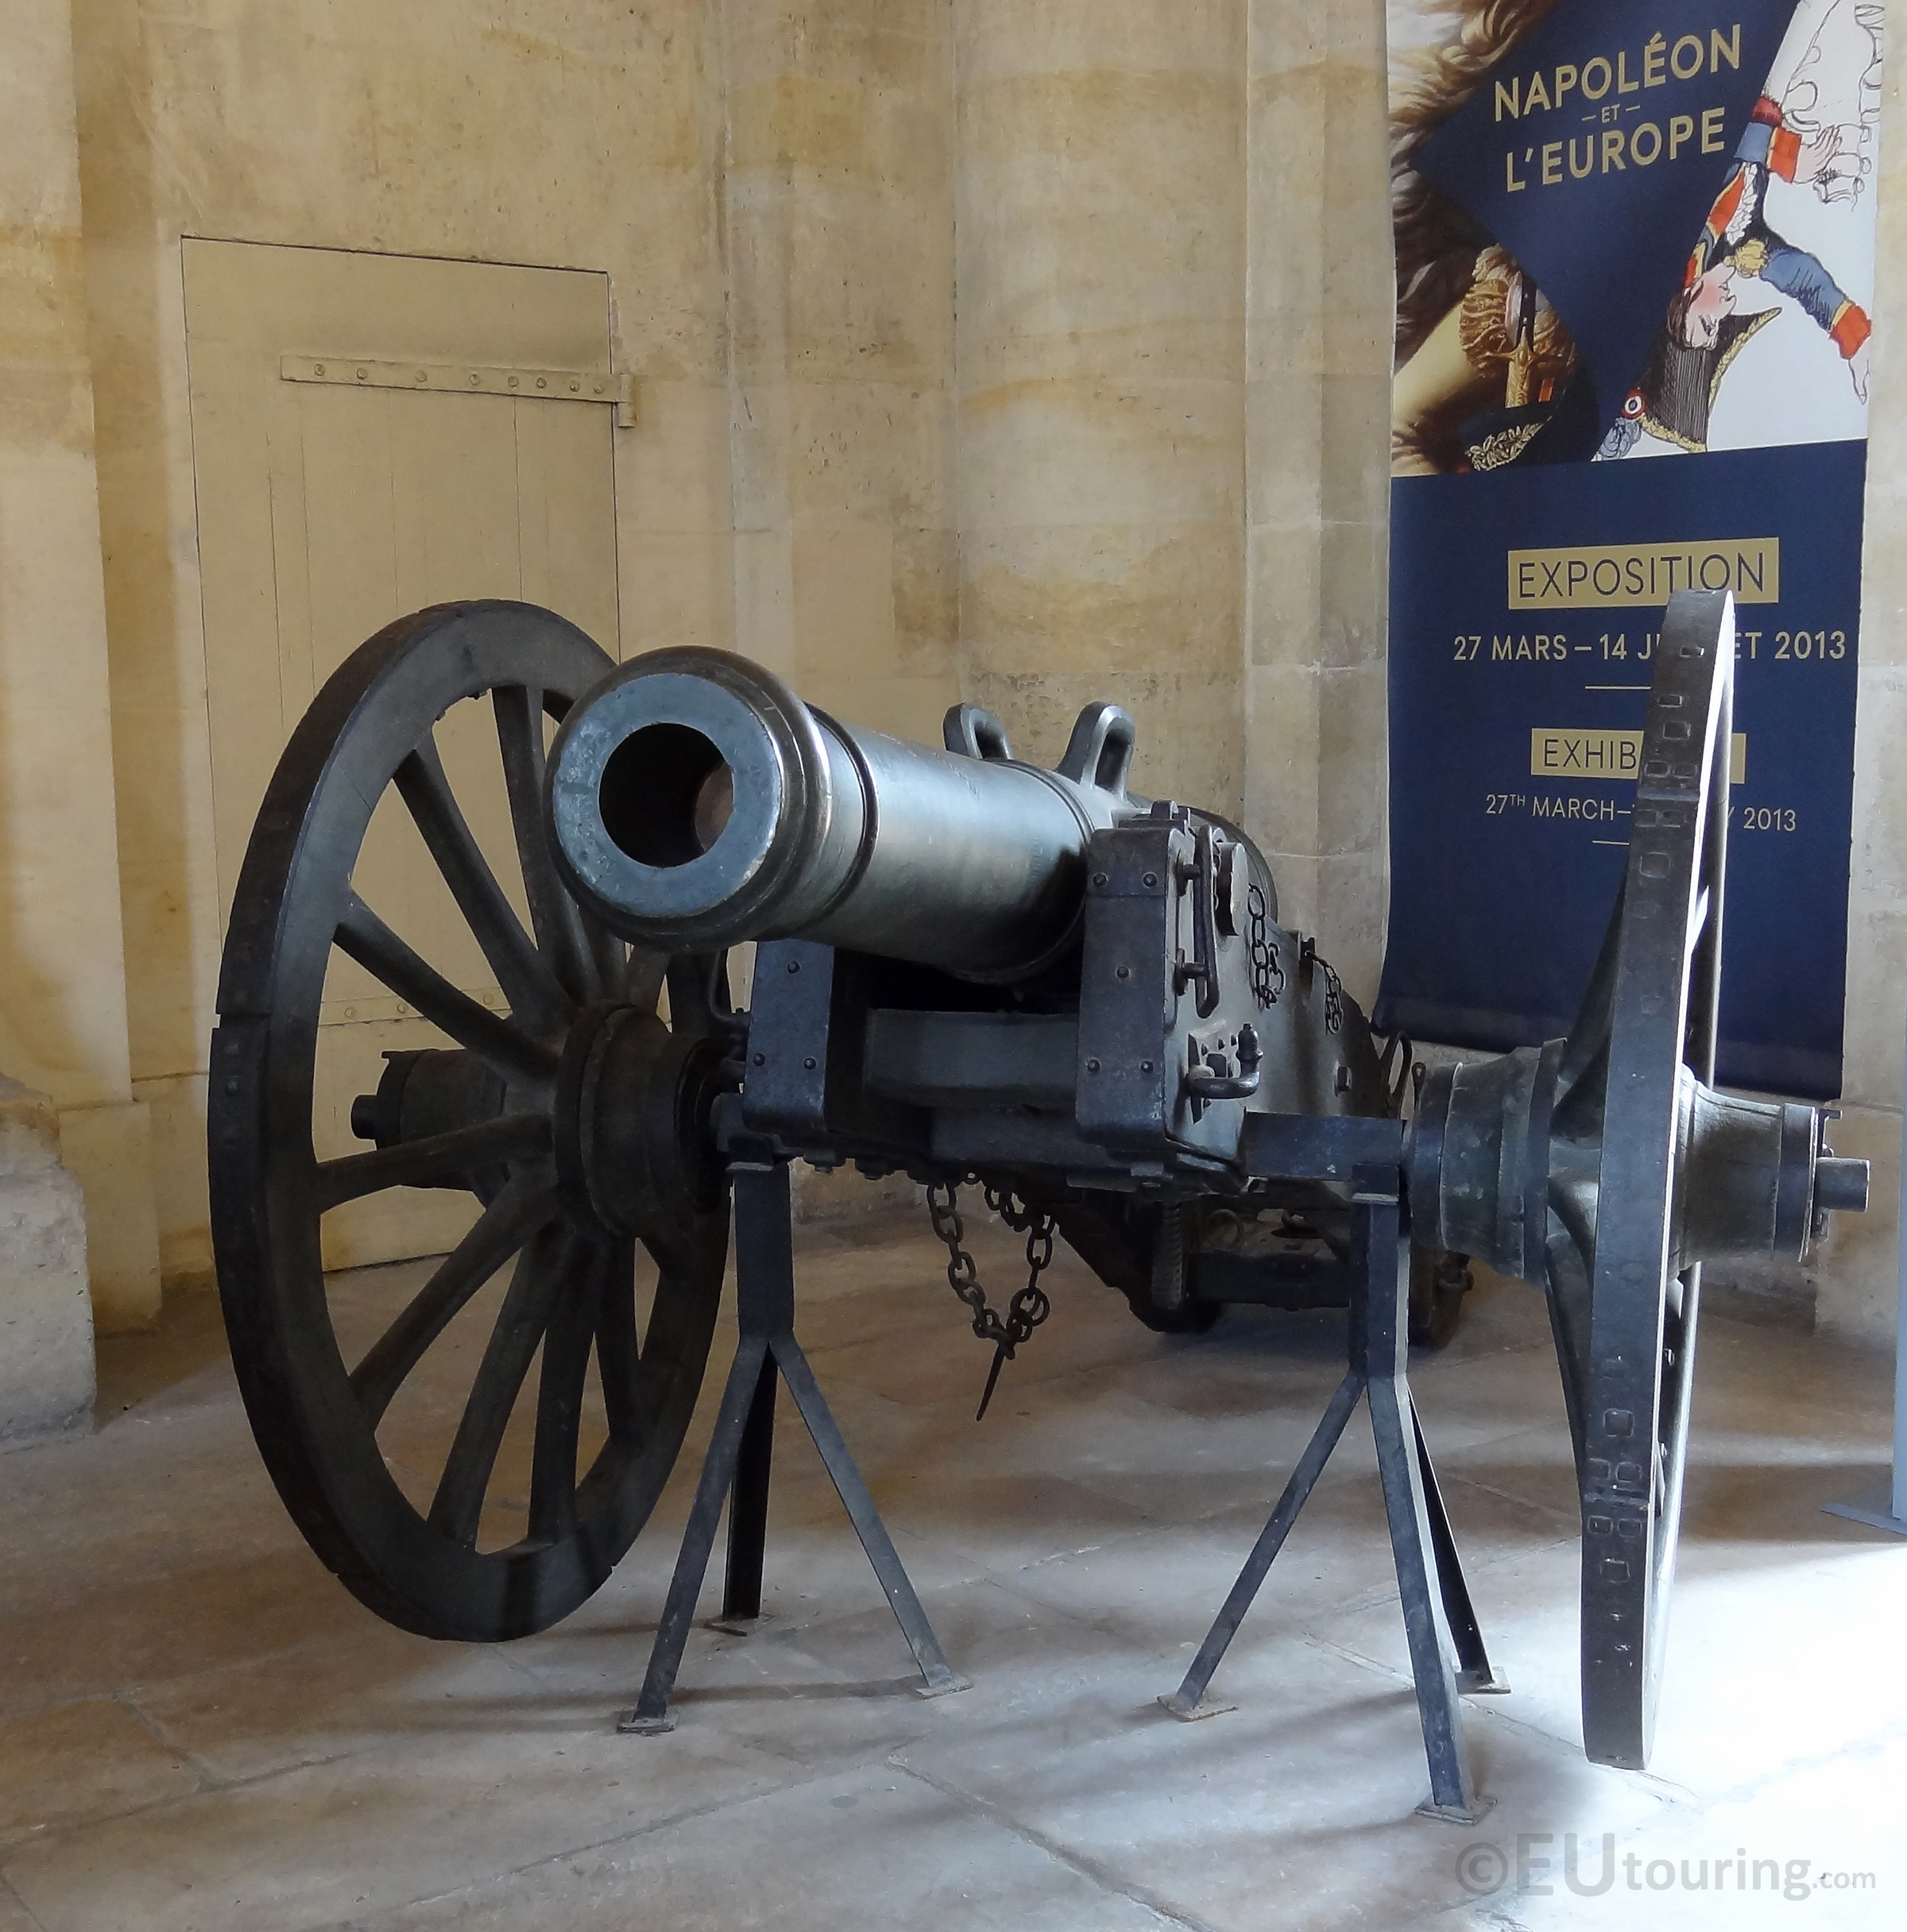 Historic cannon at Les Invalides